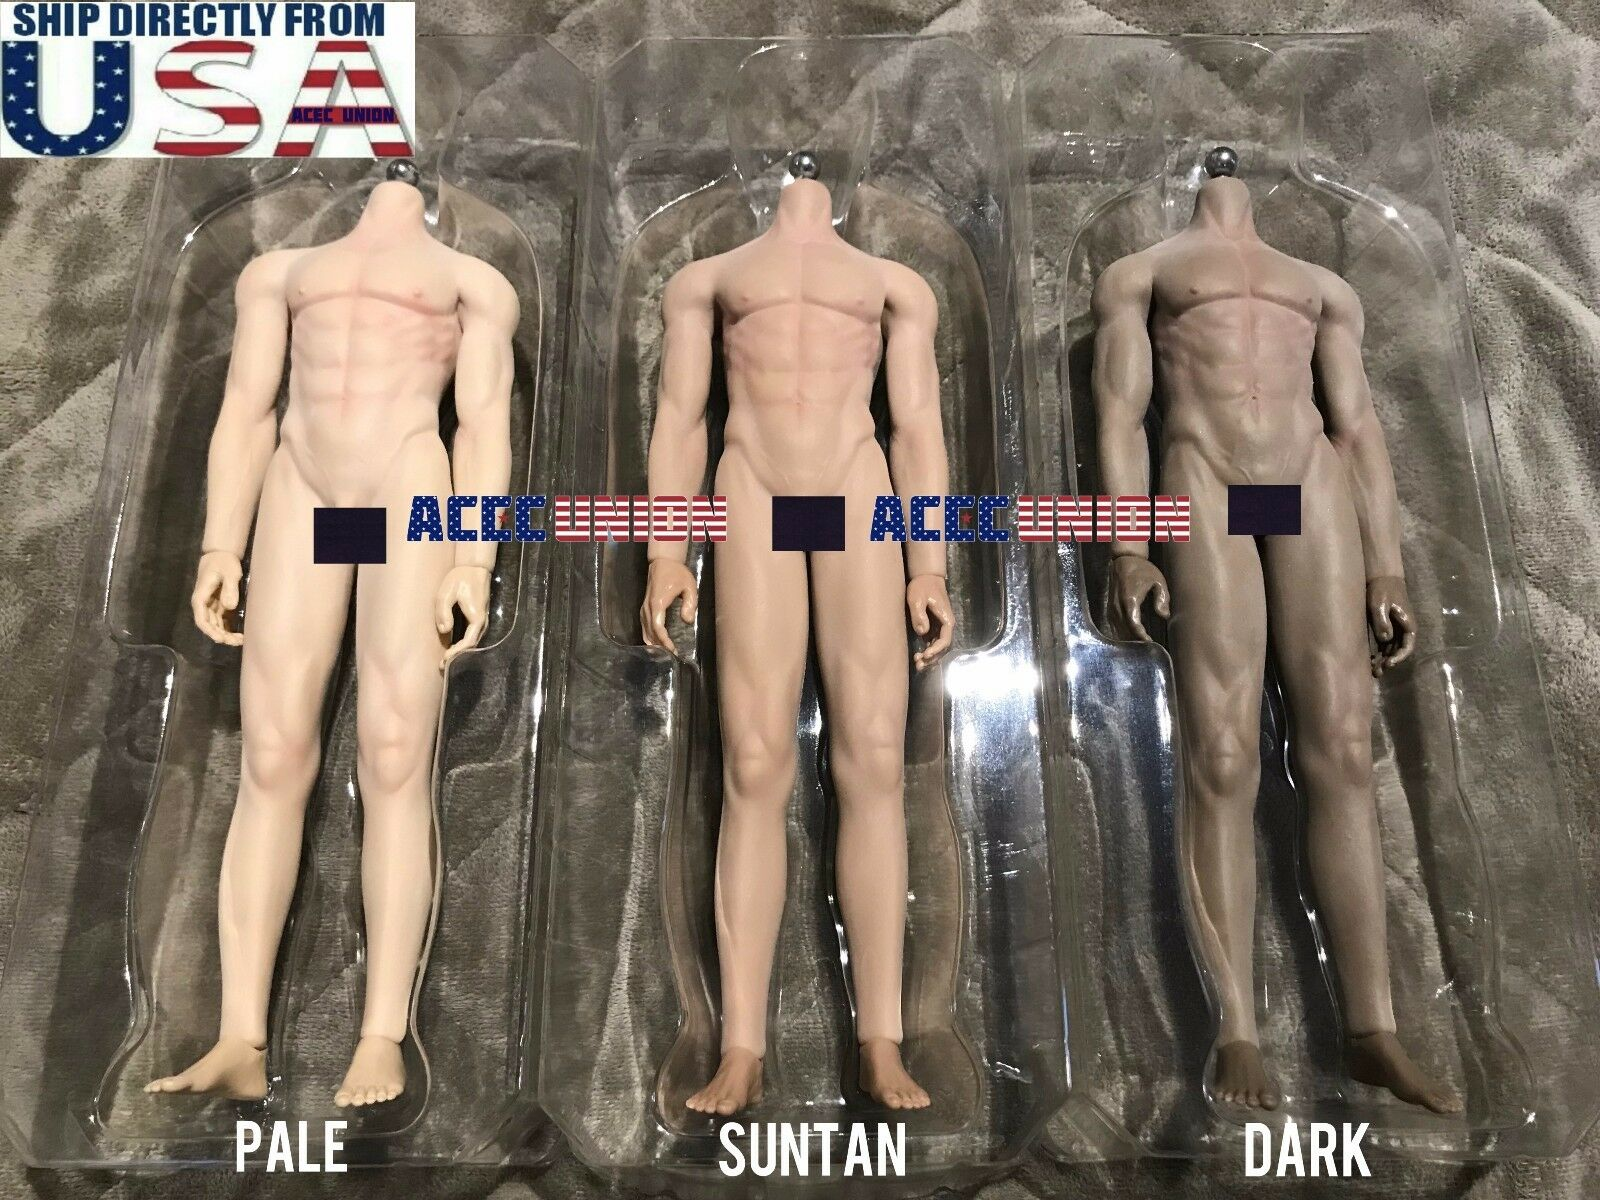 Купить JIAOUDOLL - JIAOUDOL 1/6 Flexible Seamless Male Muscular Figure Body PALE SUNTAN DARK U.S.A.